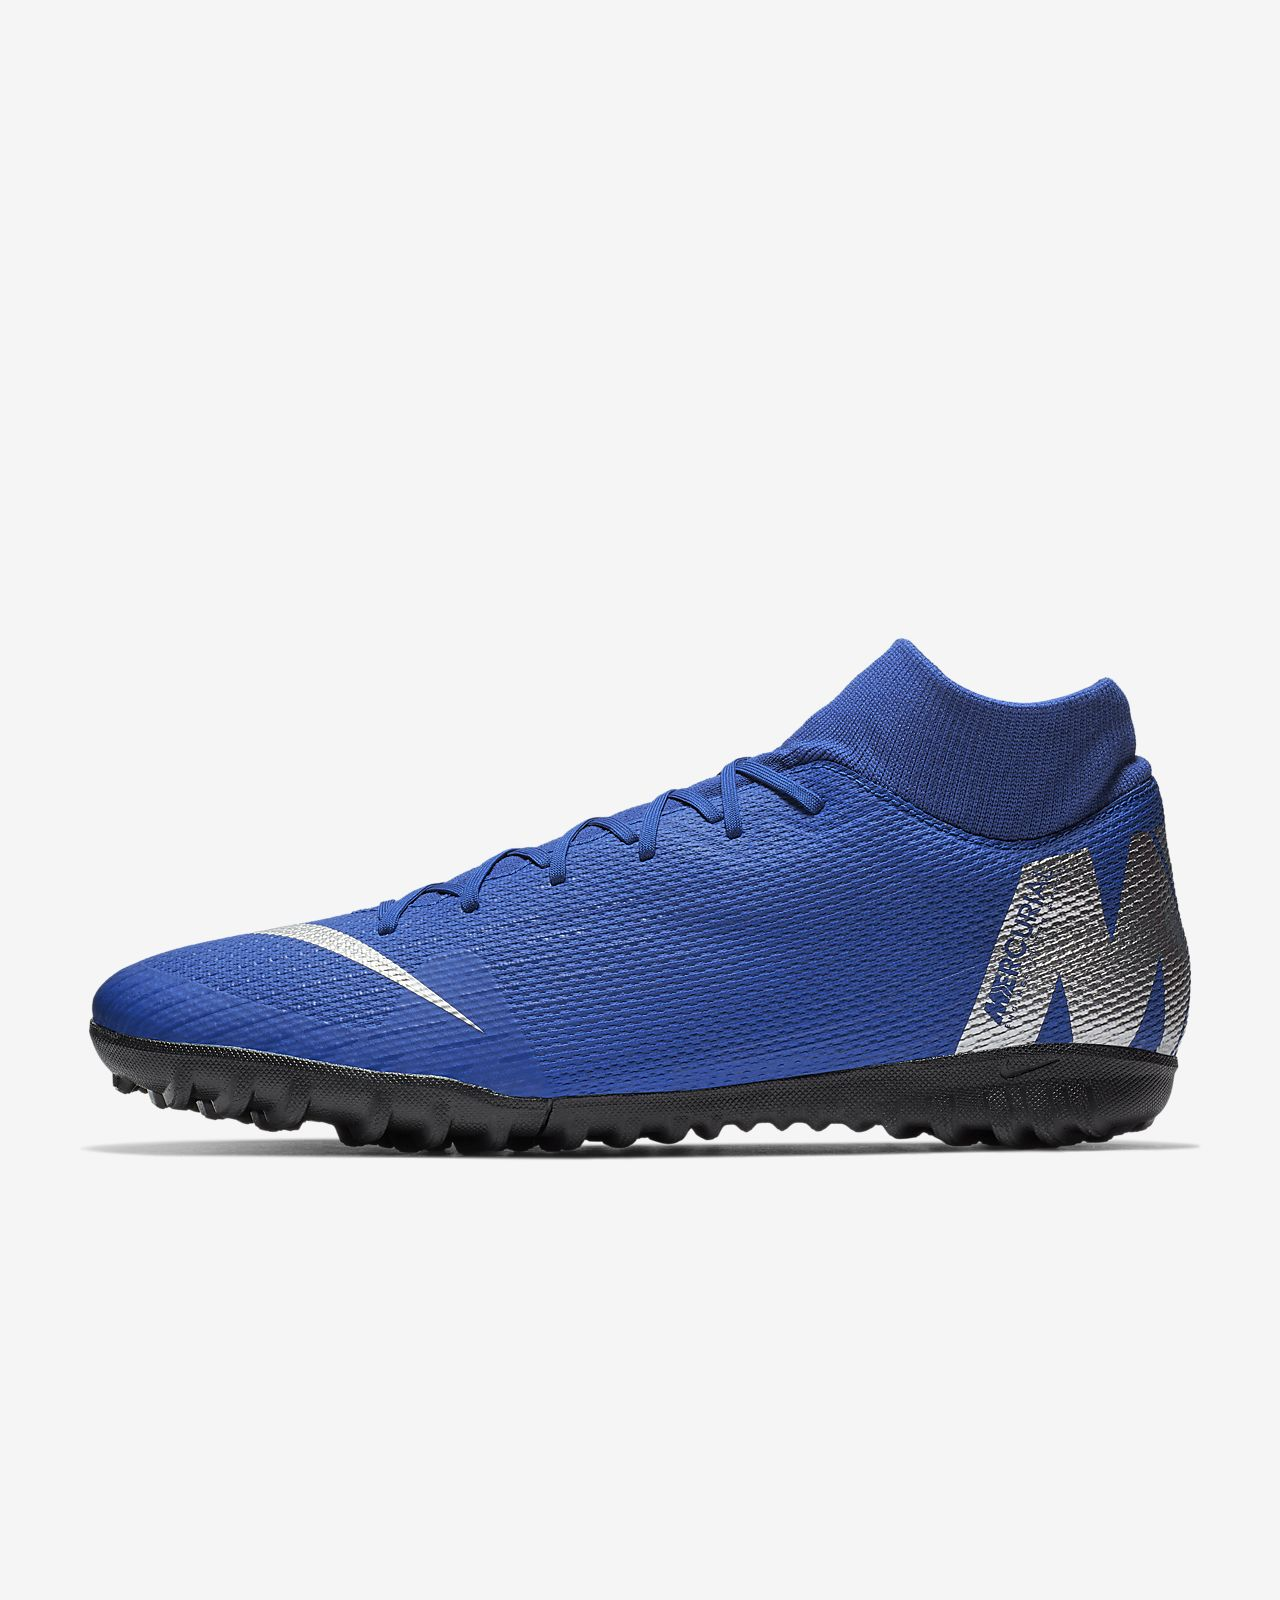 Nike MercurialX Superfly VI Academy Botes de futbol per a terreny artificial i moqueta - turf